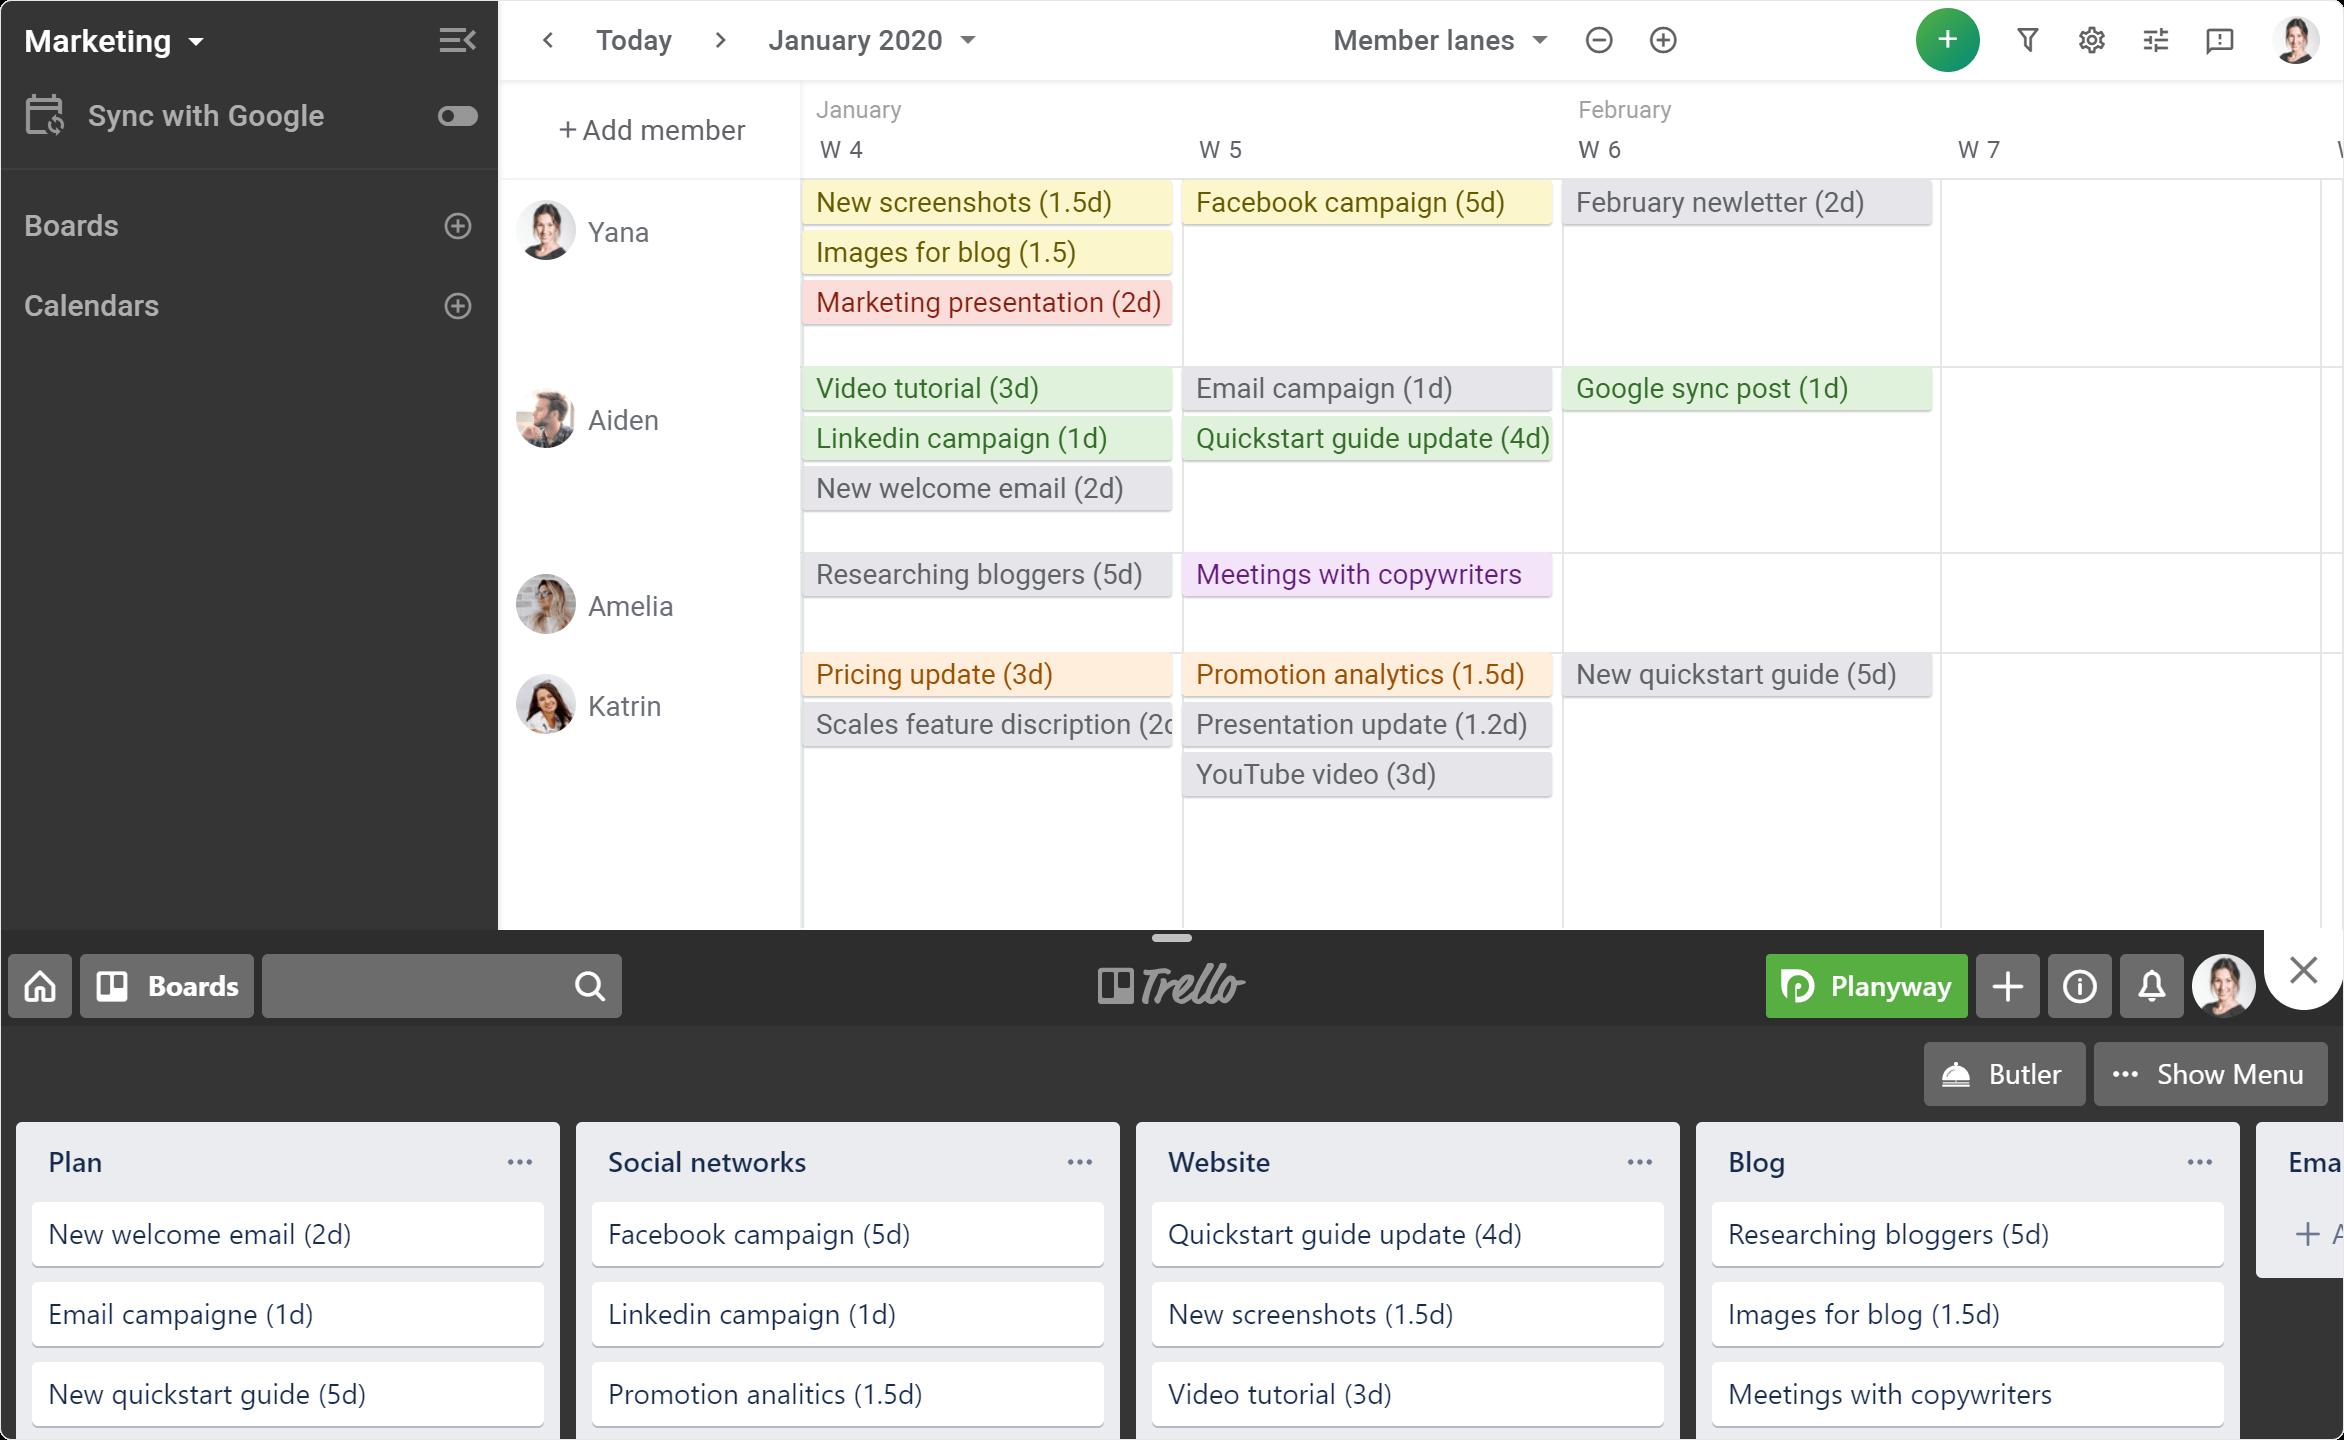 team-calendar-for-agile-weekly-planning-screenshot image